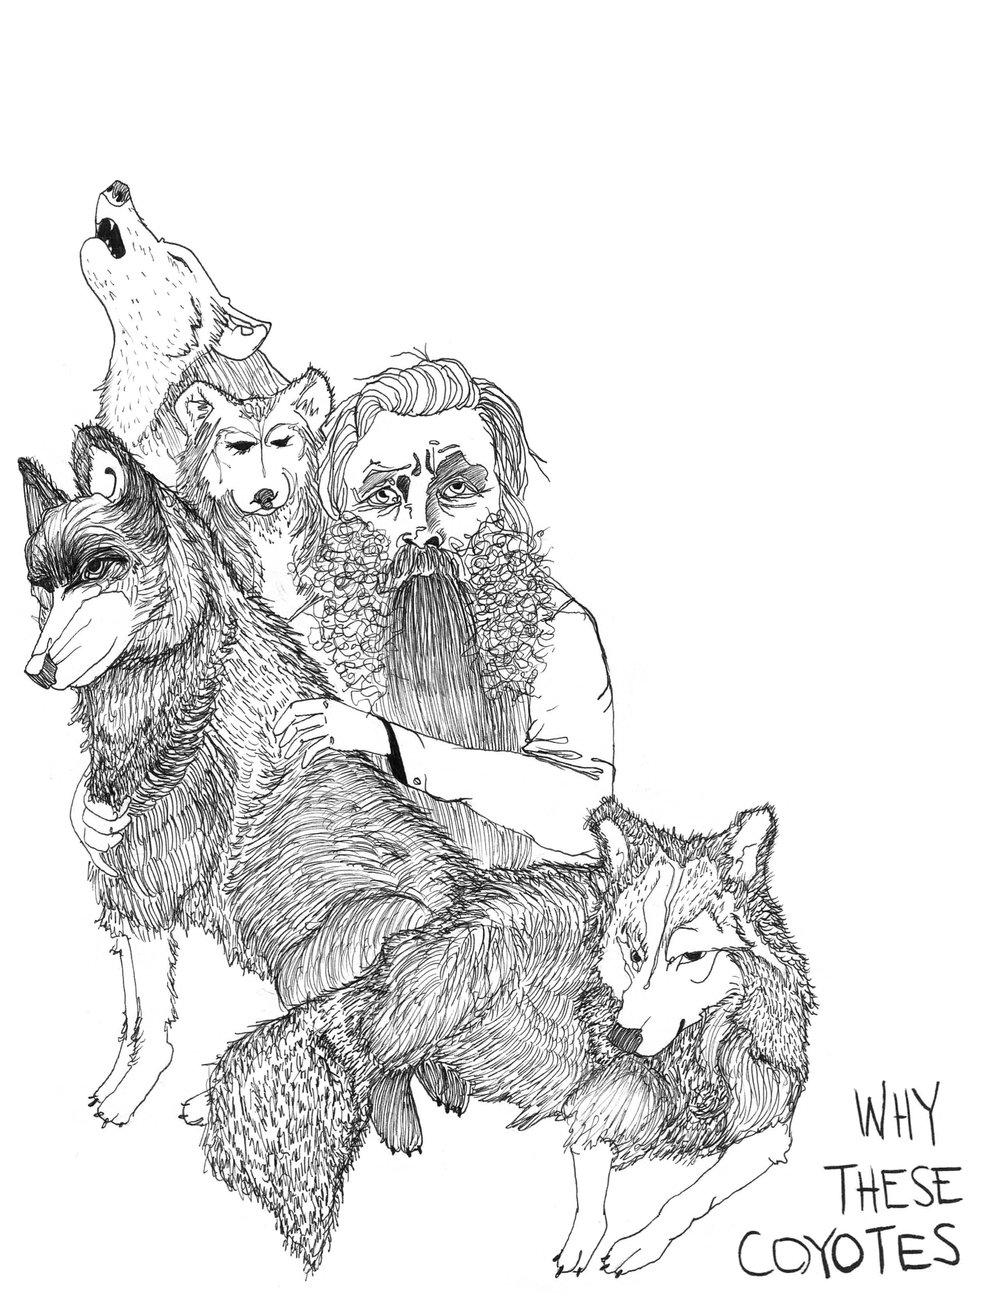 Artwork by Celeste Bogle, check out her art  here.